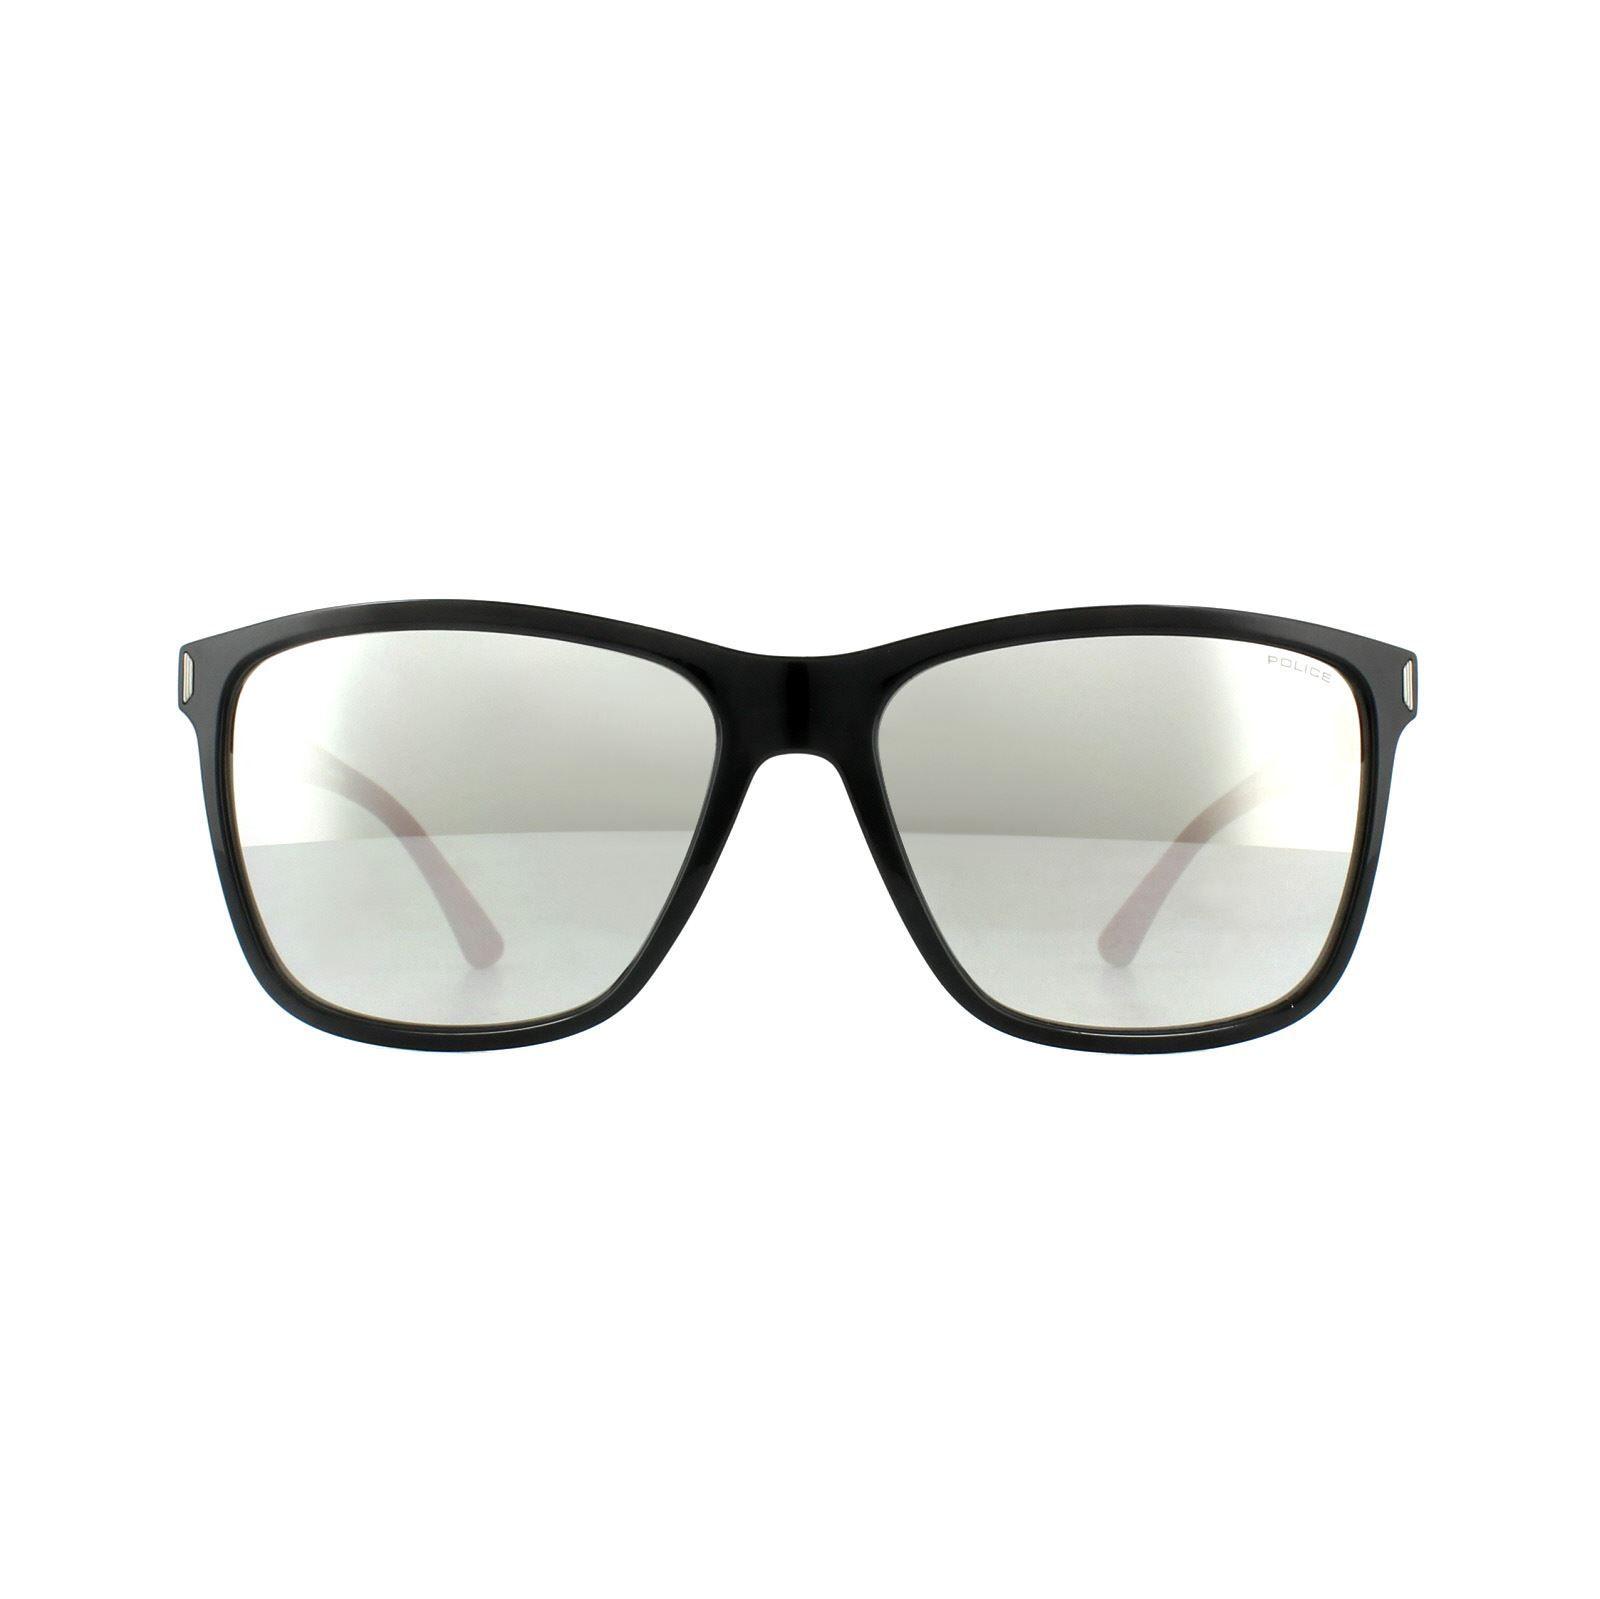 Police Sunglasses SPL529 Speed 10 Z42X Shiny Black Red Silver Mirror